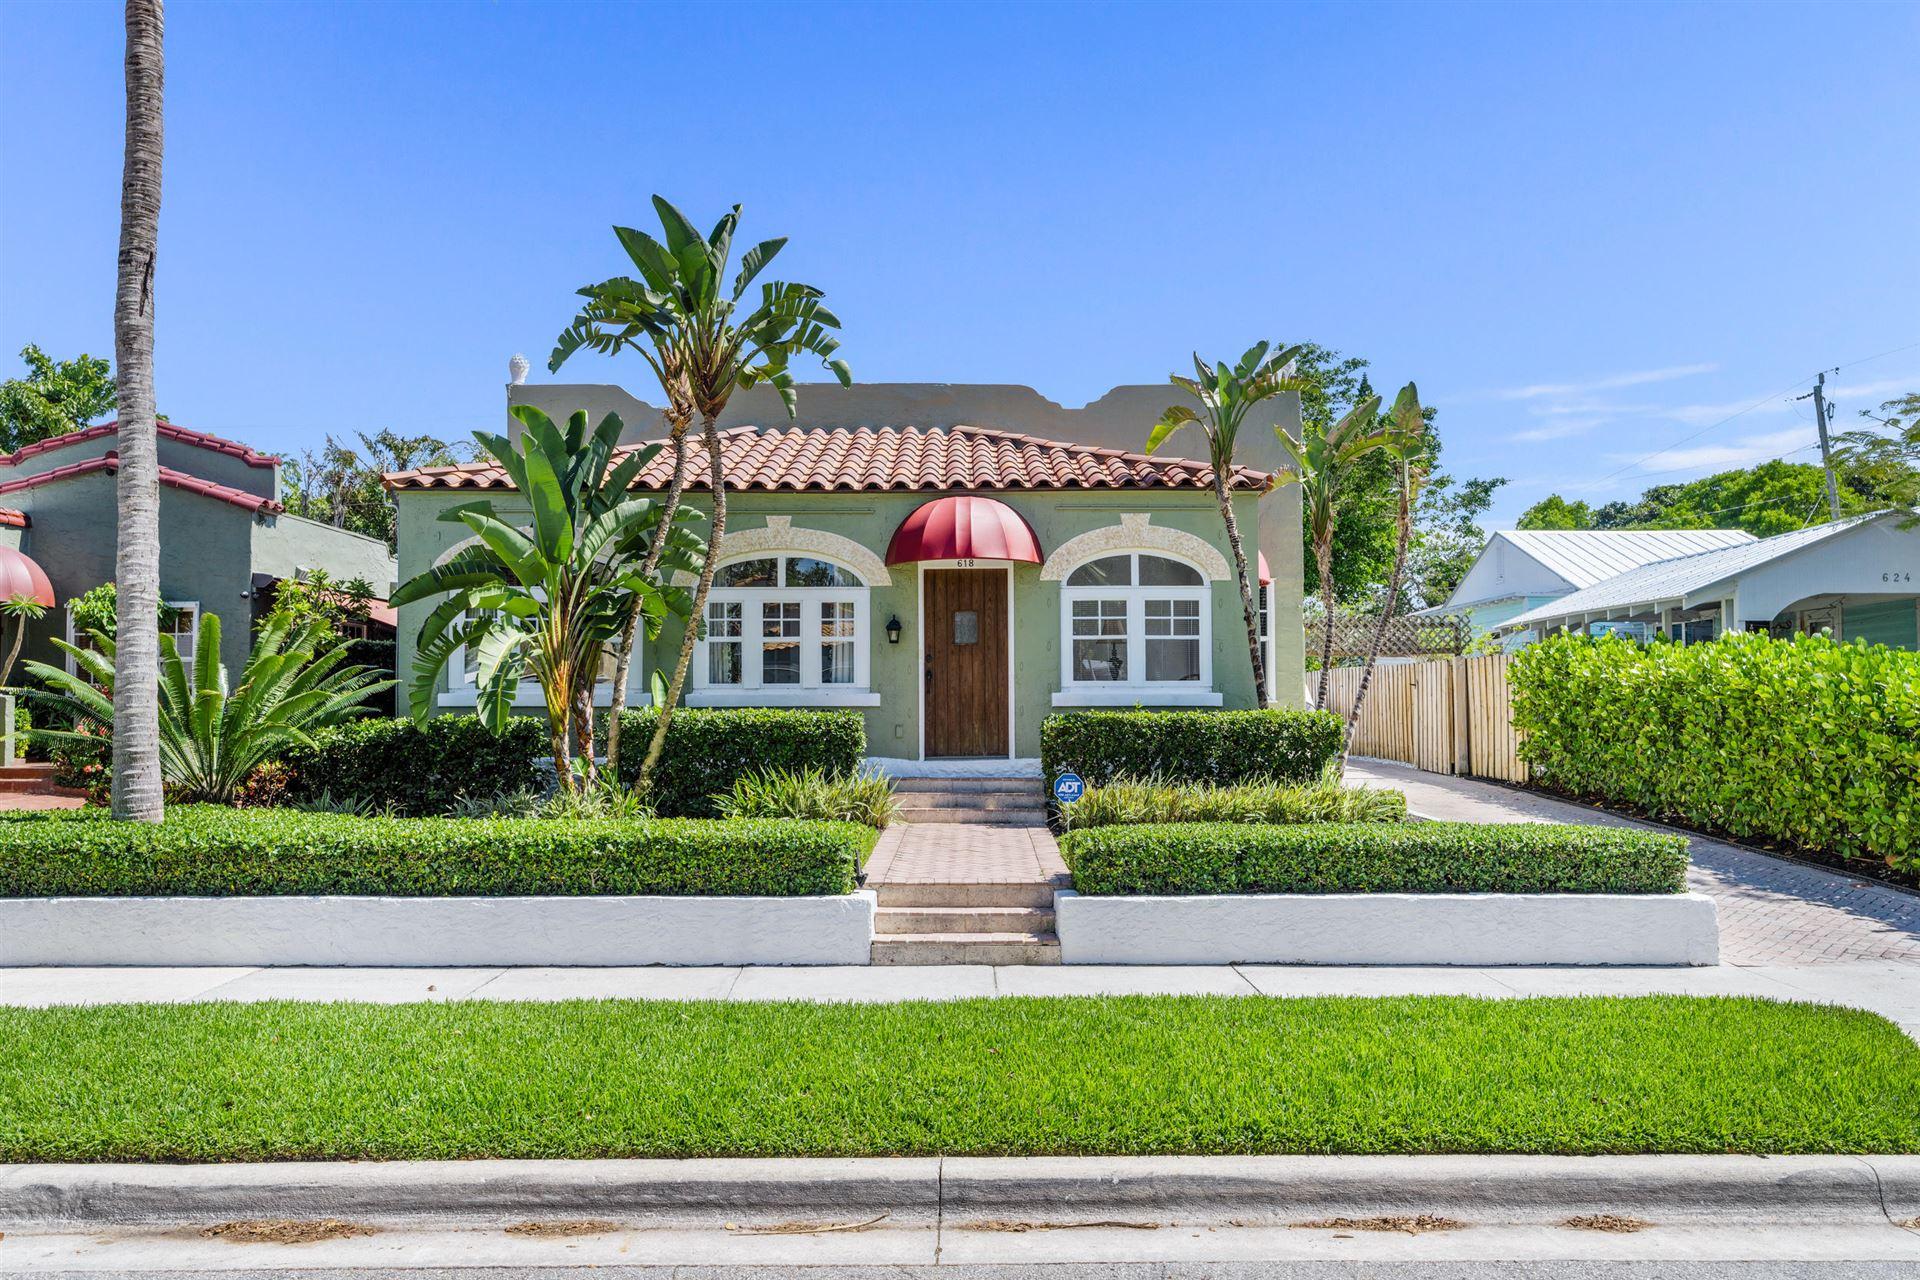 618 Upland Road, West Palm Beach, FL 33401 - MLS#: RX-10714206